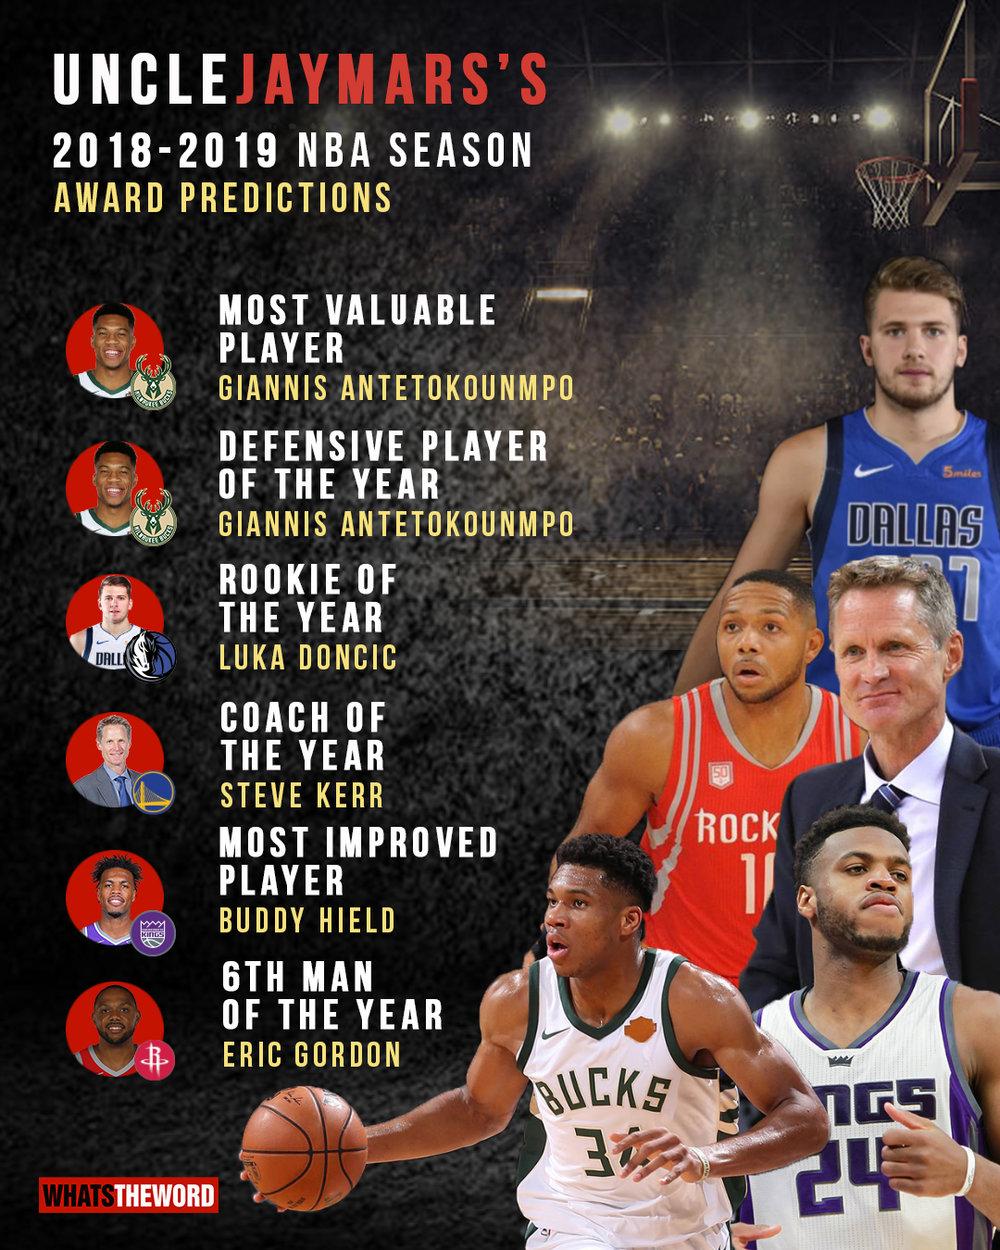 c7ca152550c UNCLEJAYMARS S 2019 NBA SEASON AWARD PREDICTIONS — WHATS THE WORD